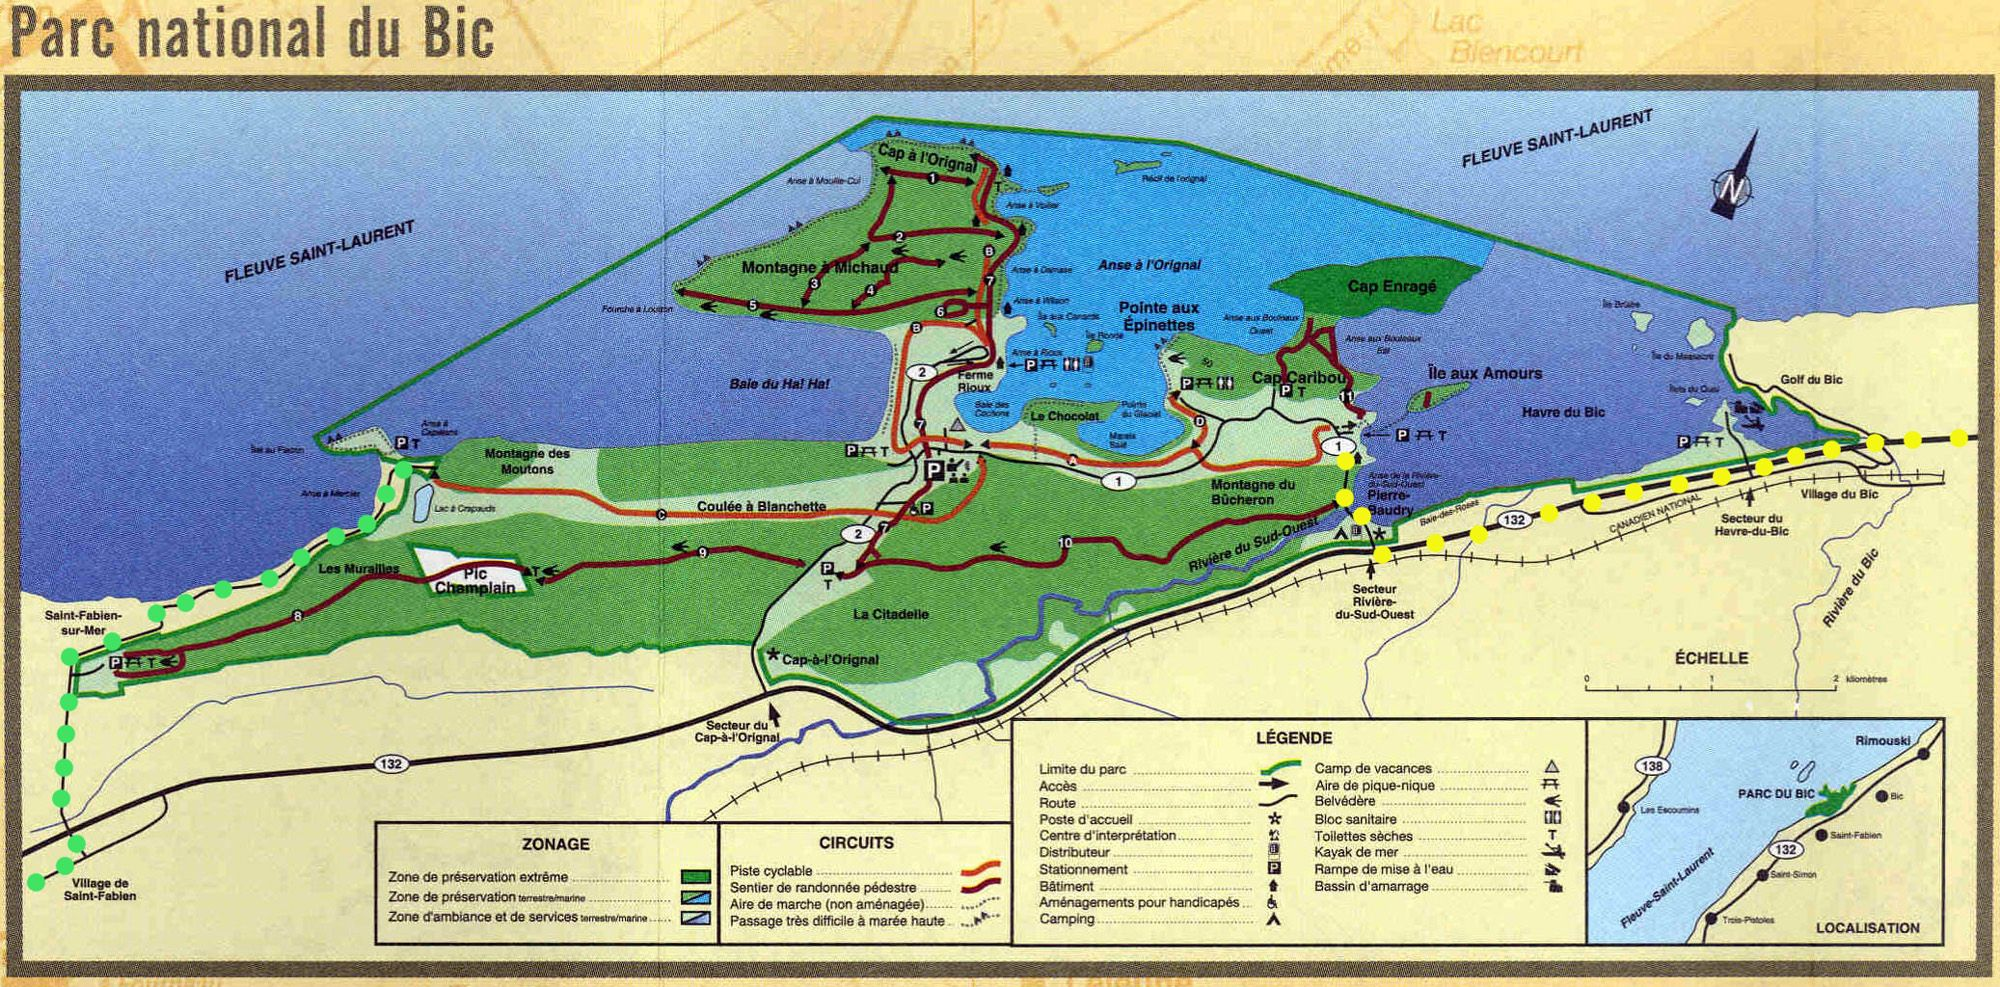 Pistes Cyclables Du Parc National Du Bic Quebec Canada Map National Map Screenshot